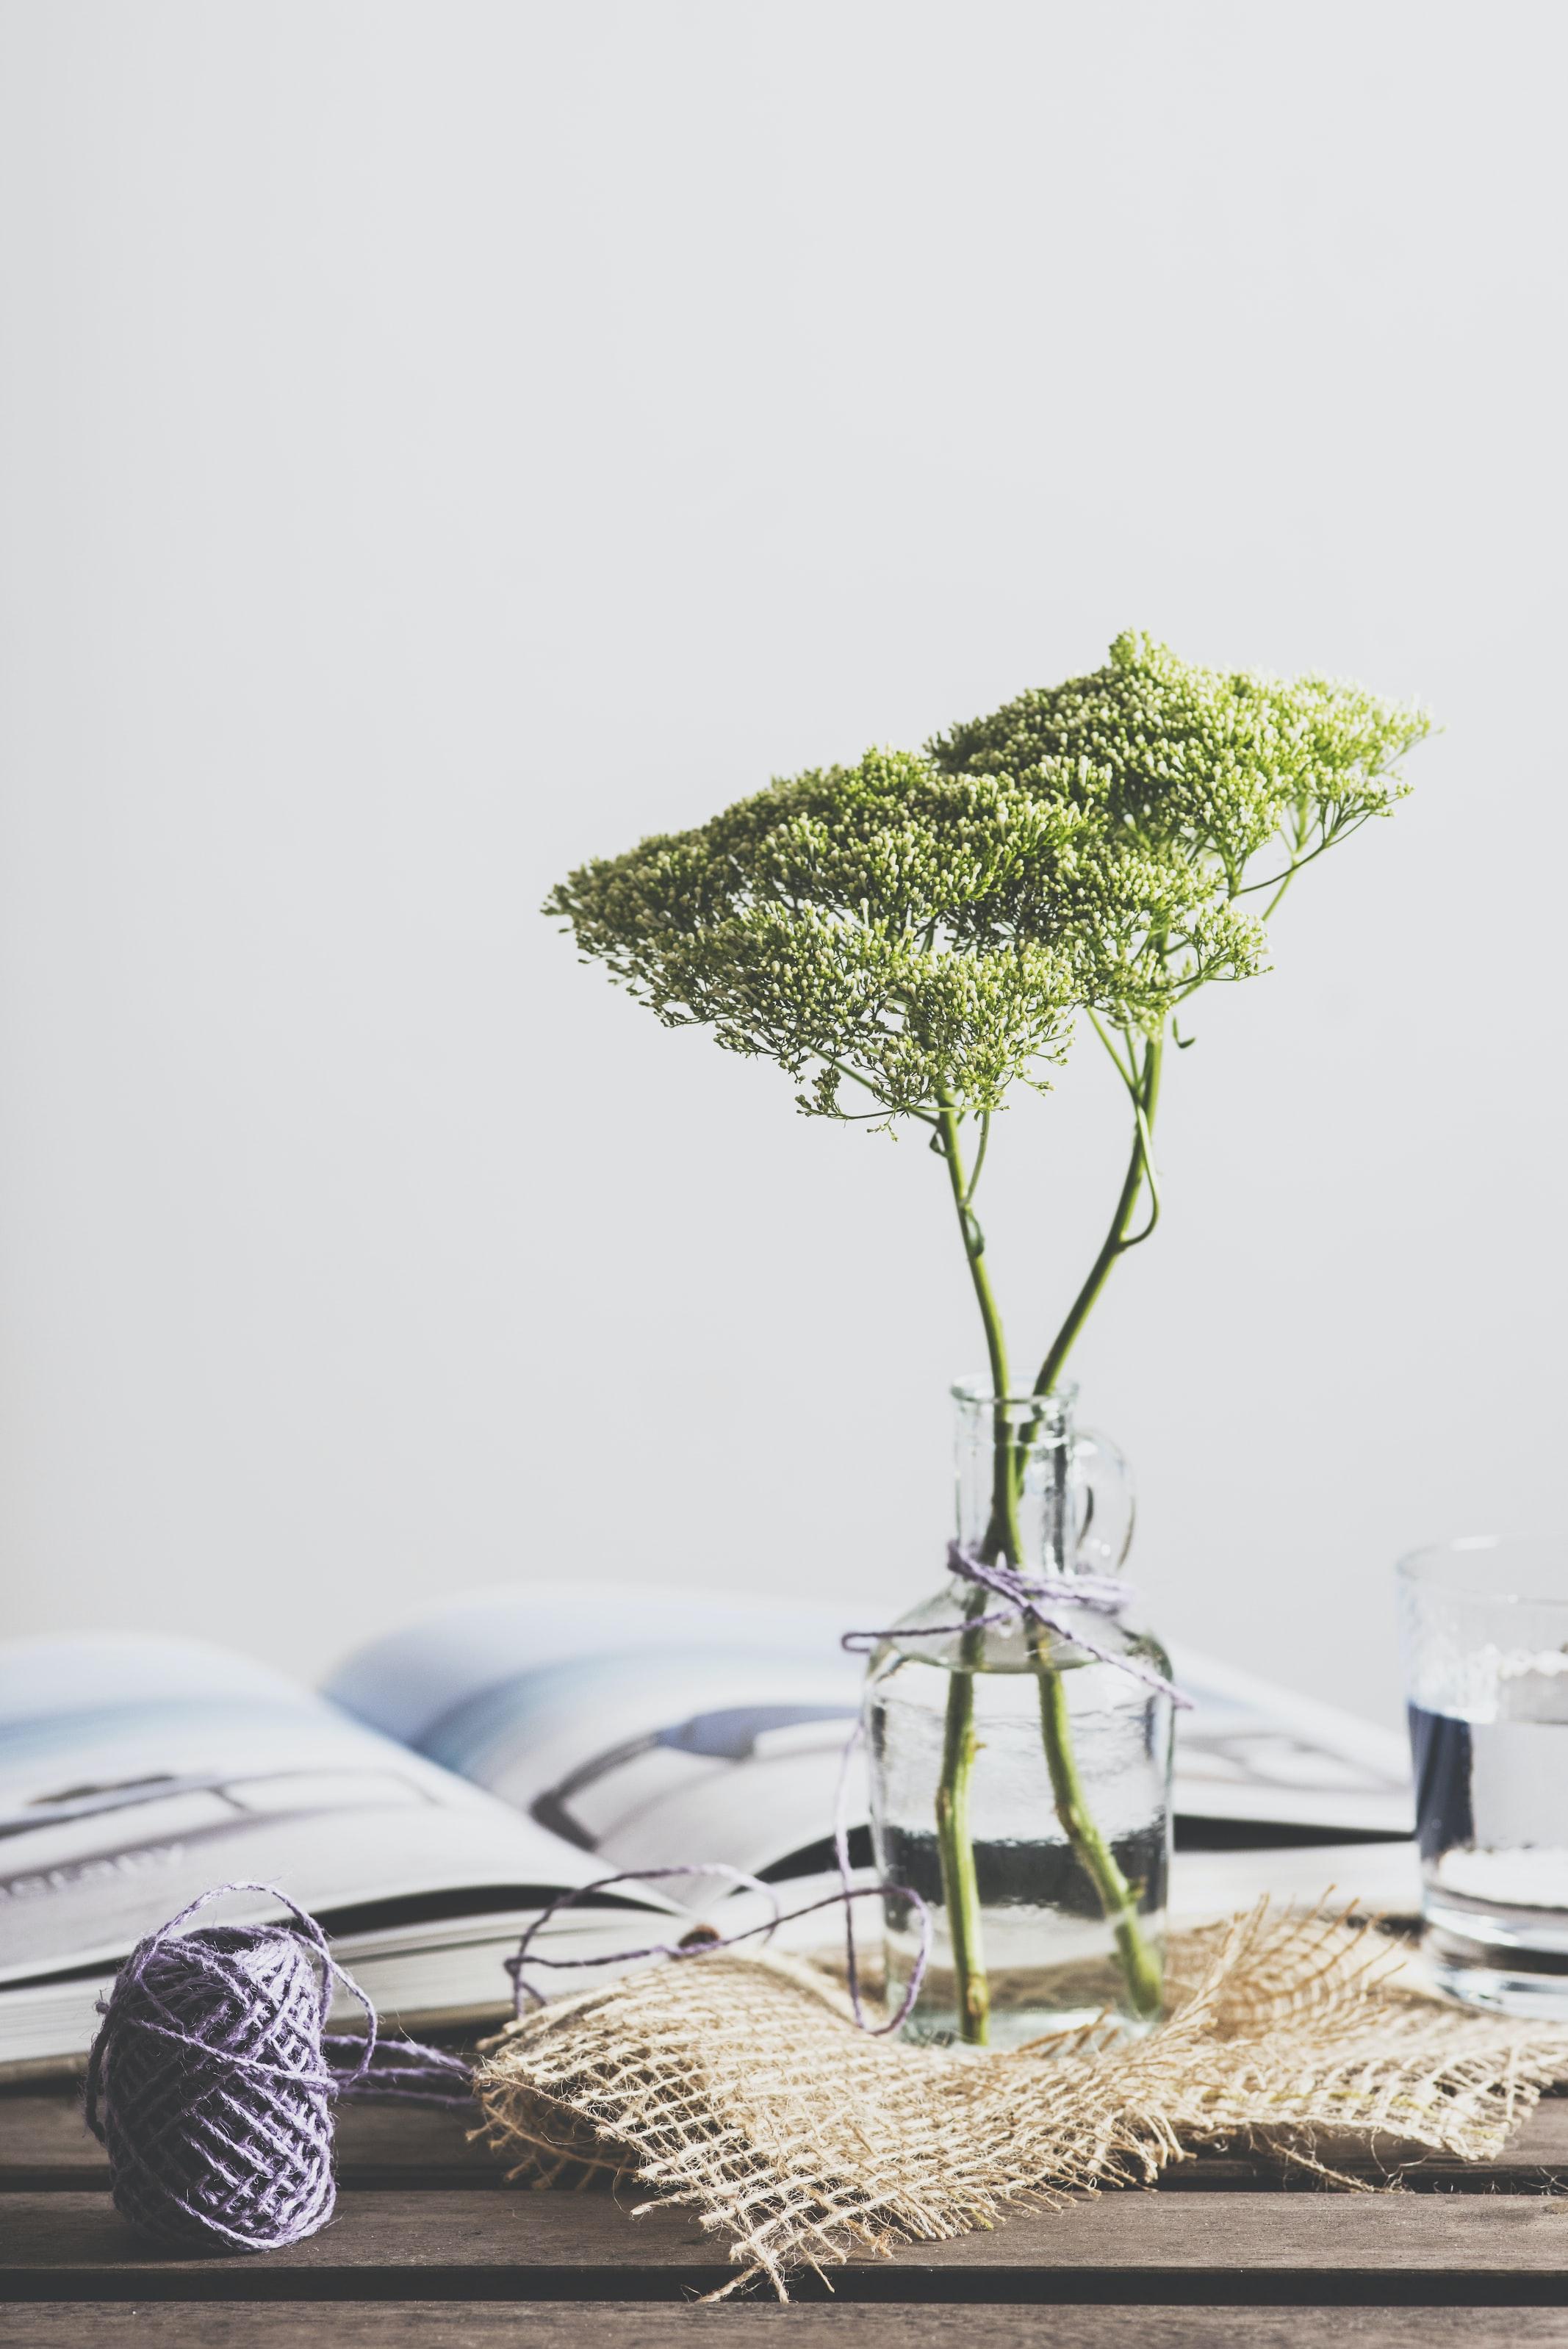 bud vase with green flowers and wabi sabi aesthetic